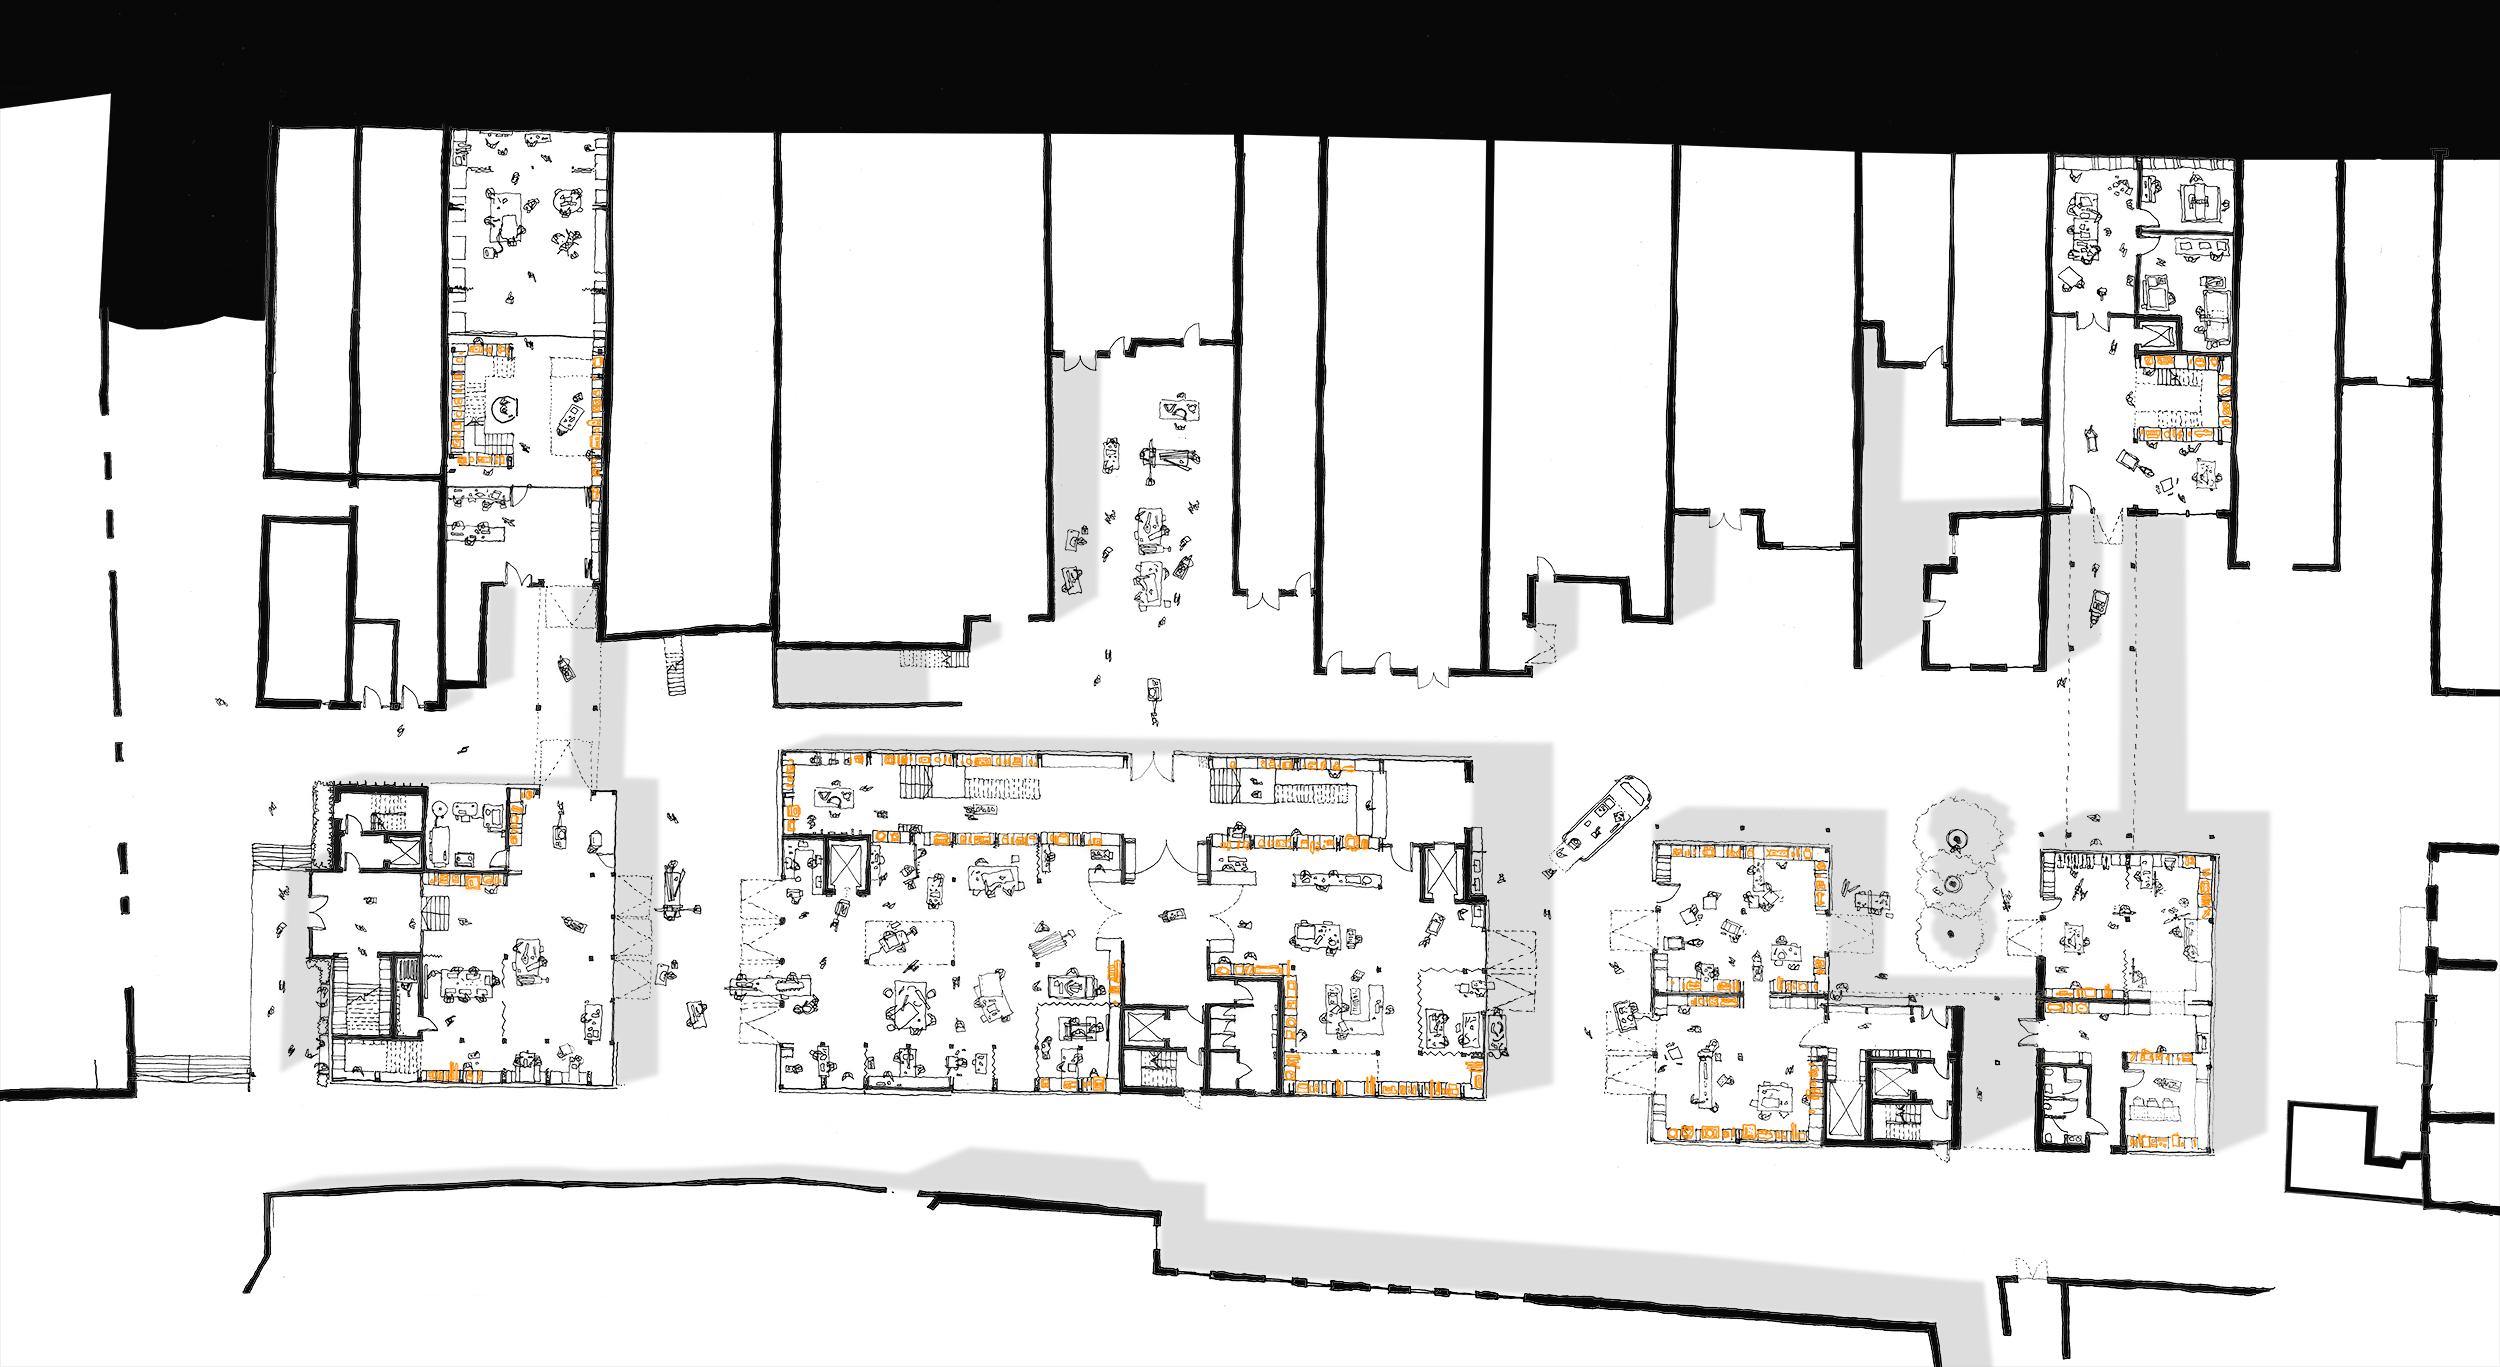 Lower ground floor plan – scaling up repairs